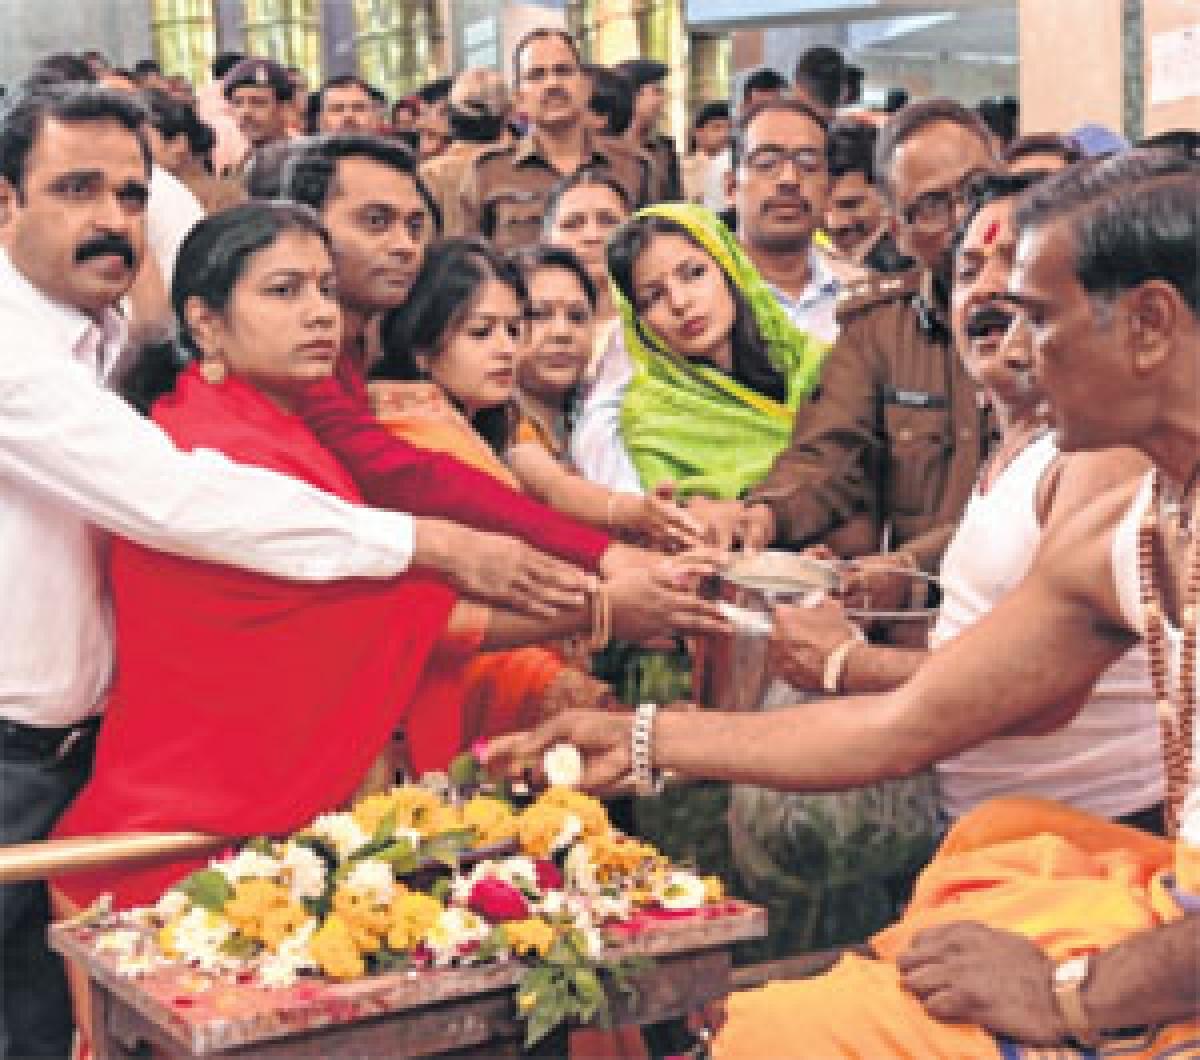 Ujjain: Lakhs flock to Mahakal Mandir on Mahashivratri